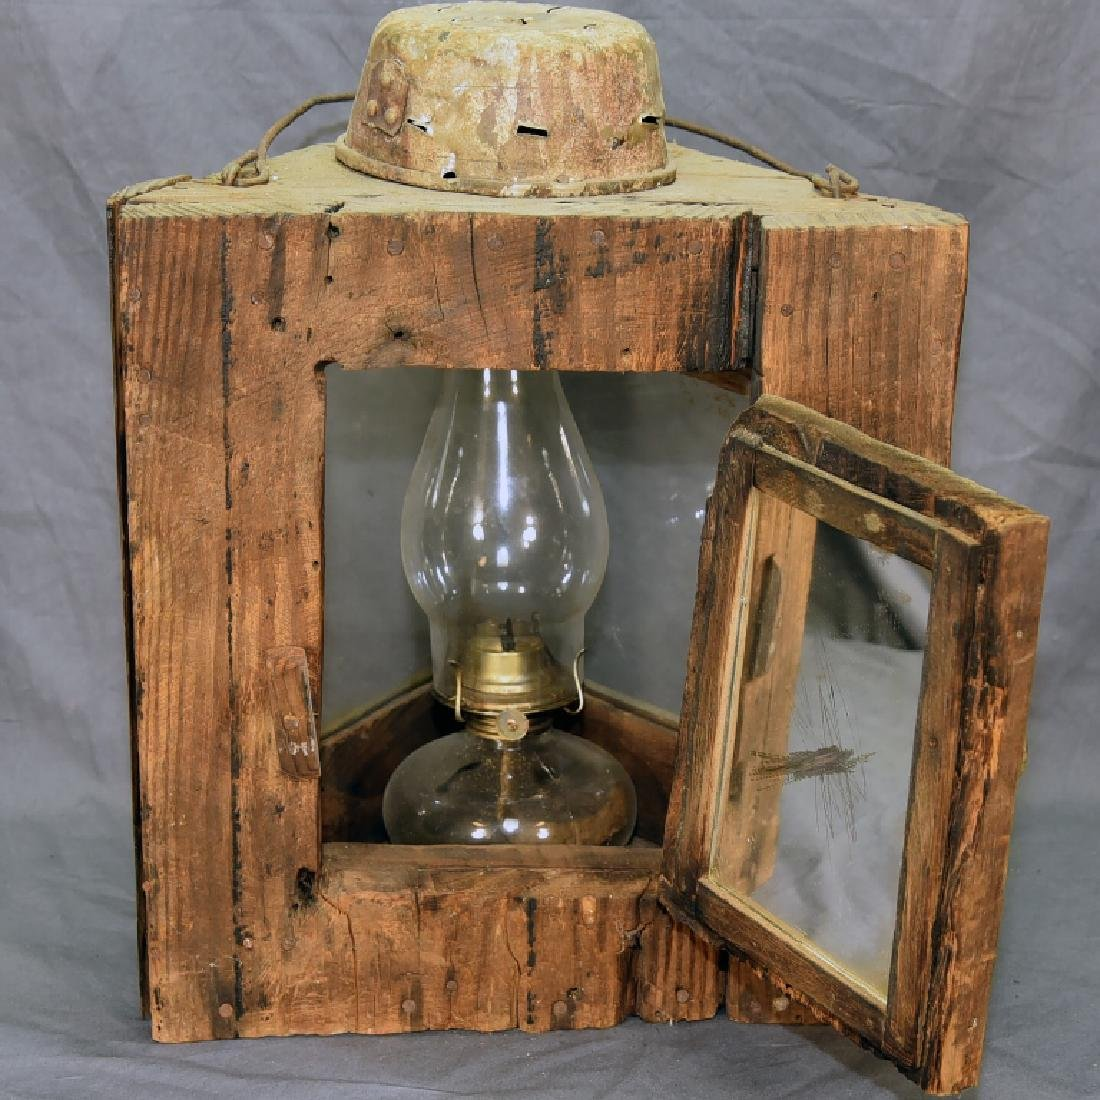 Primitive 3 Sided Duck Hunting Lantern w/ Oil Lamp - 5